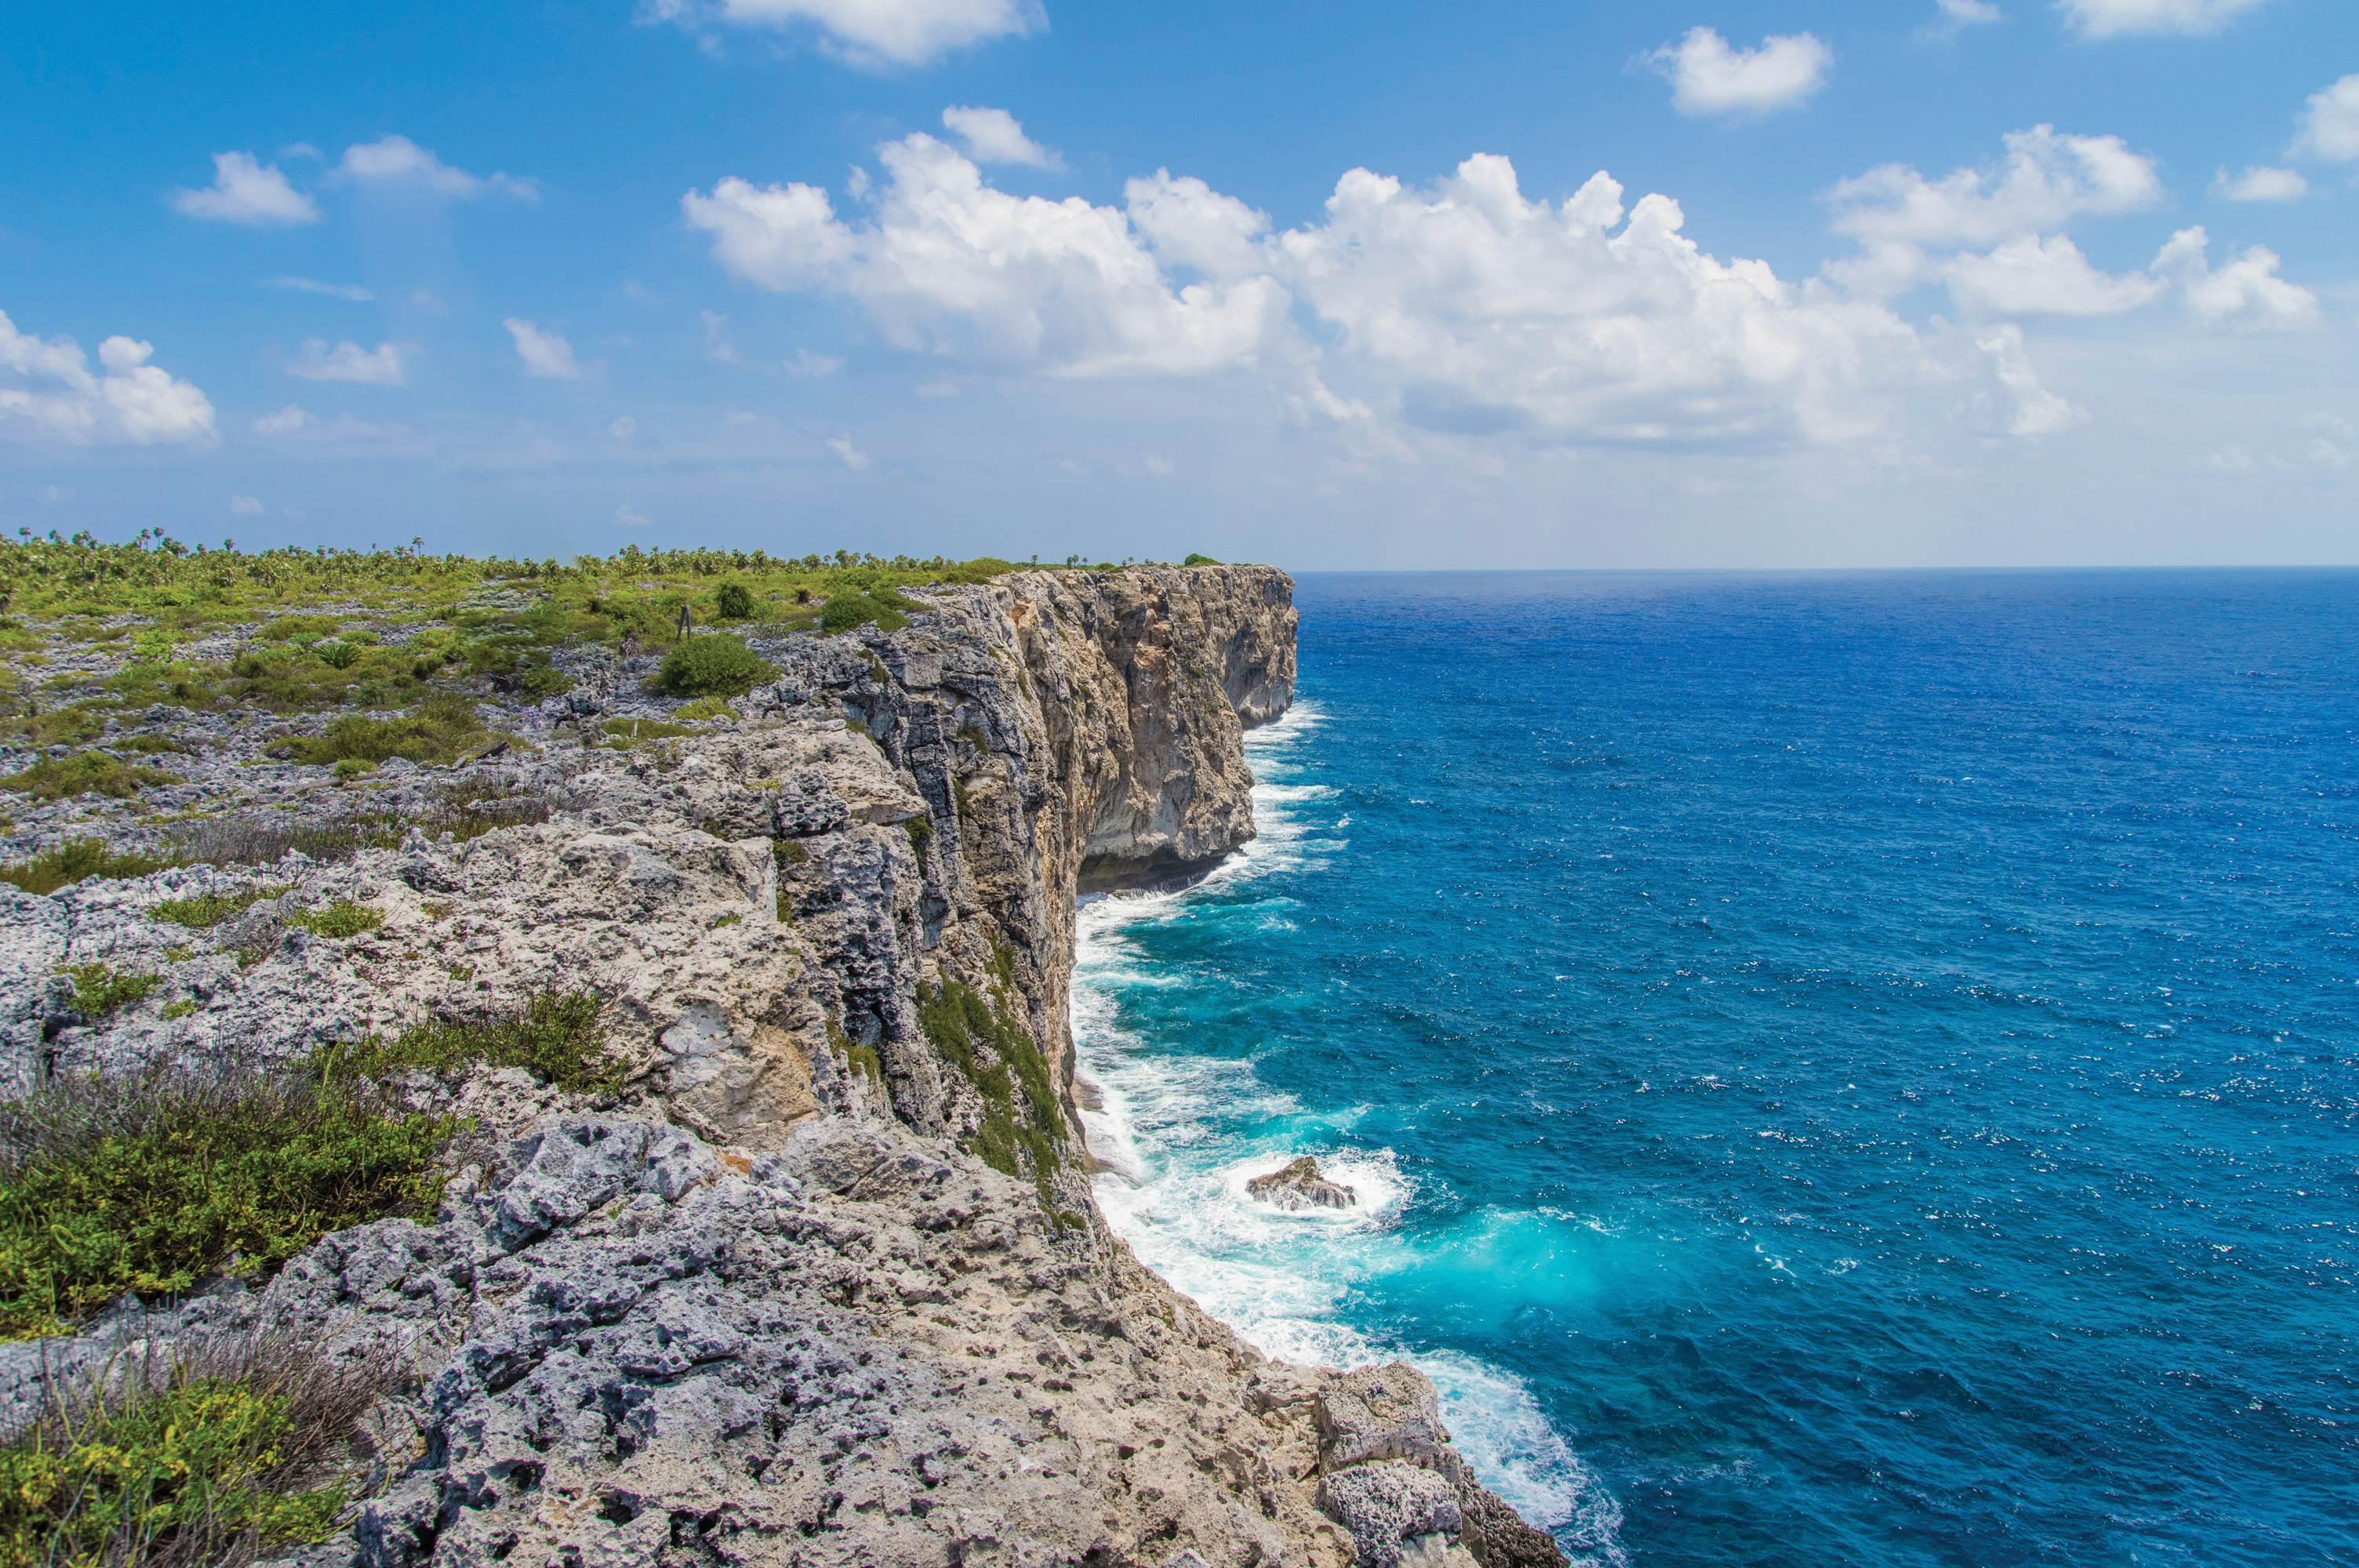 The Bluff on Cayman Brac